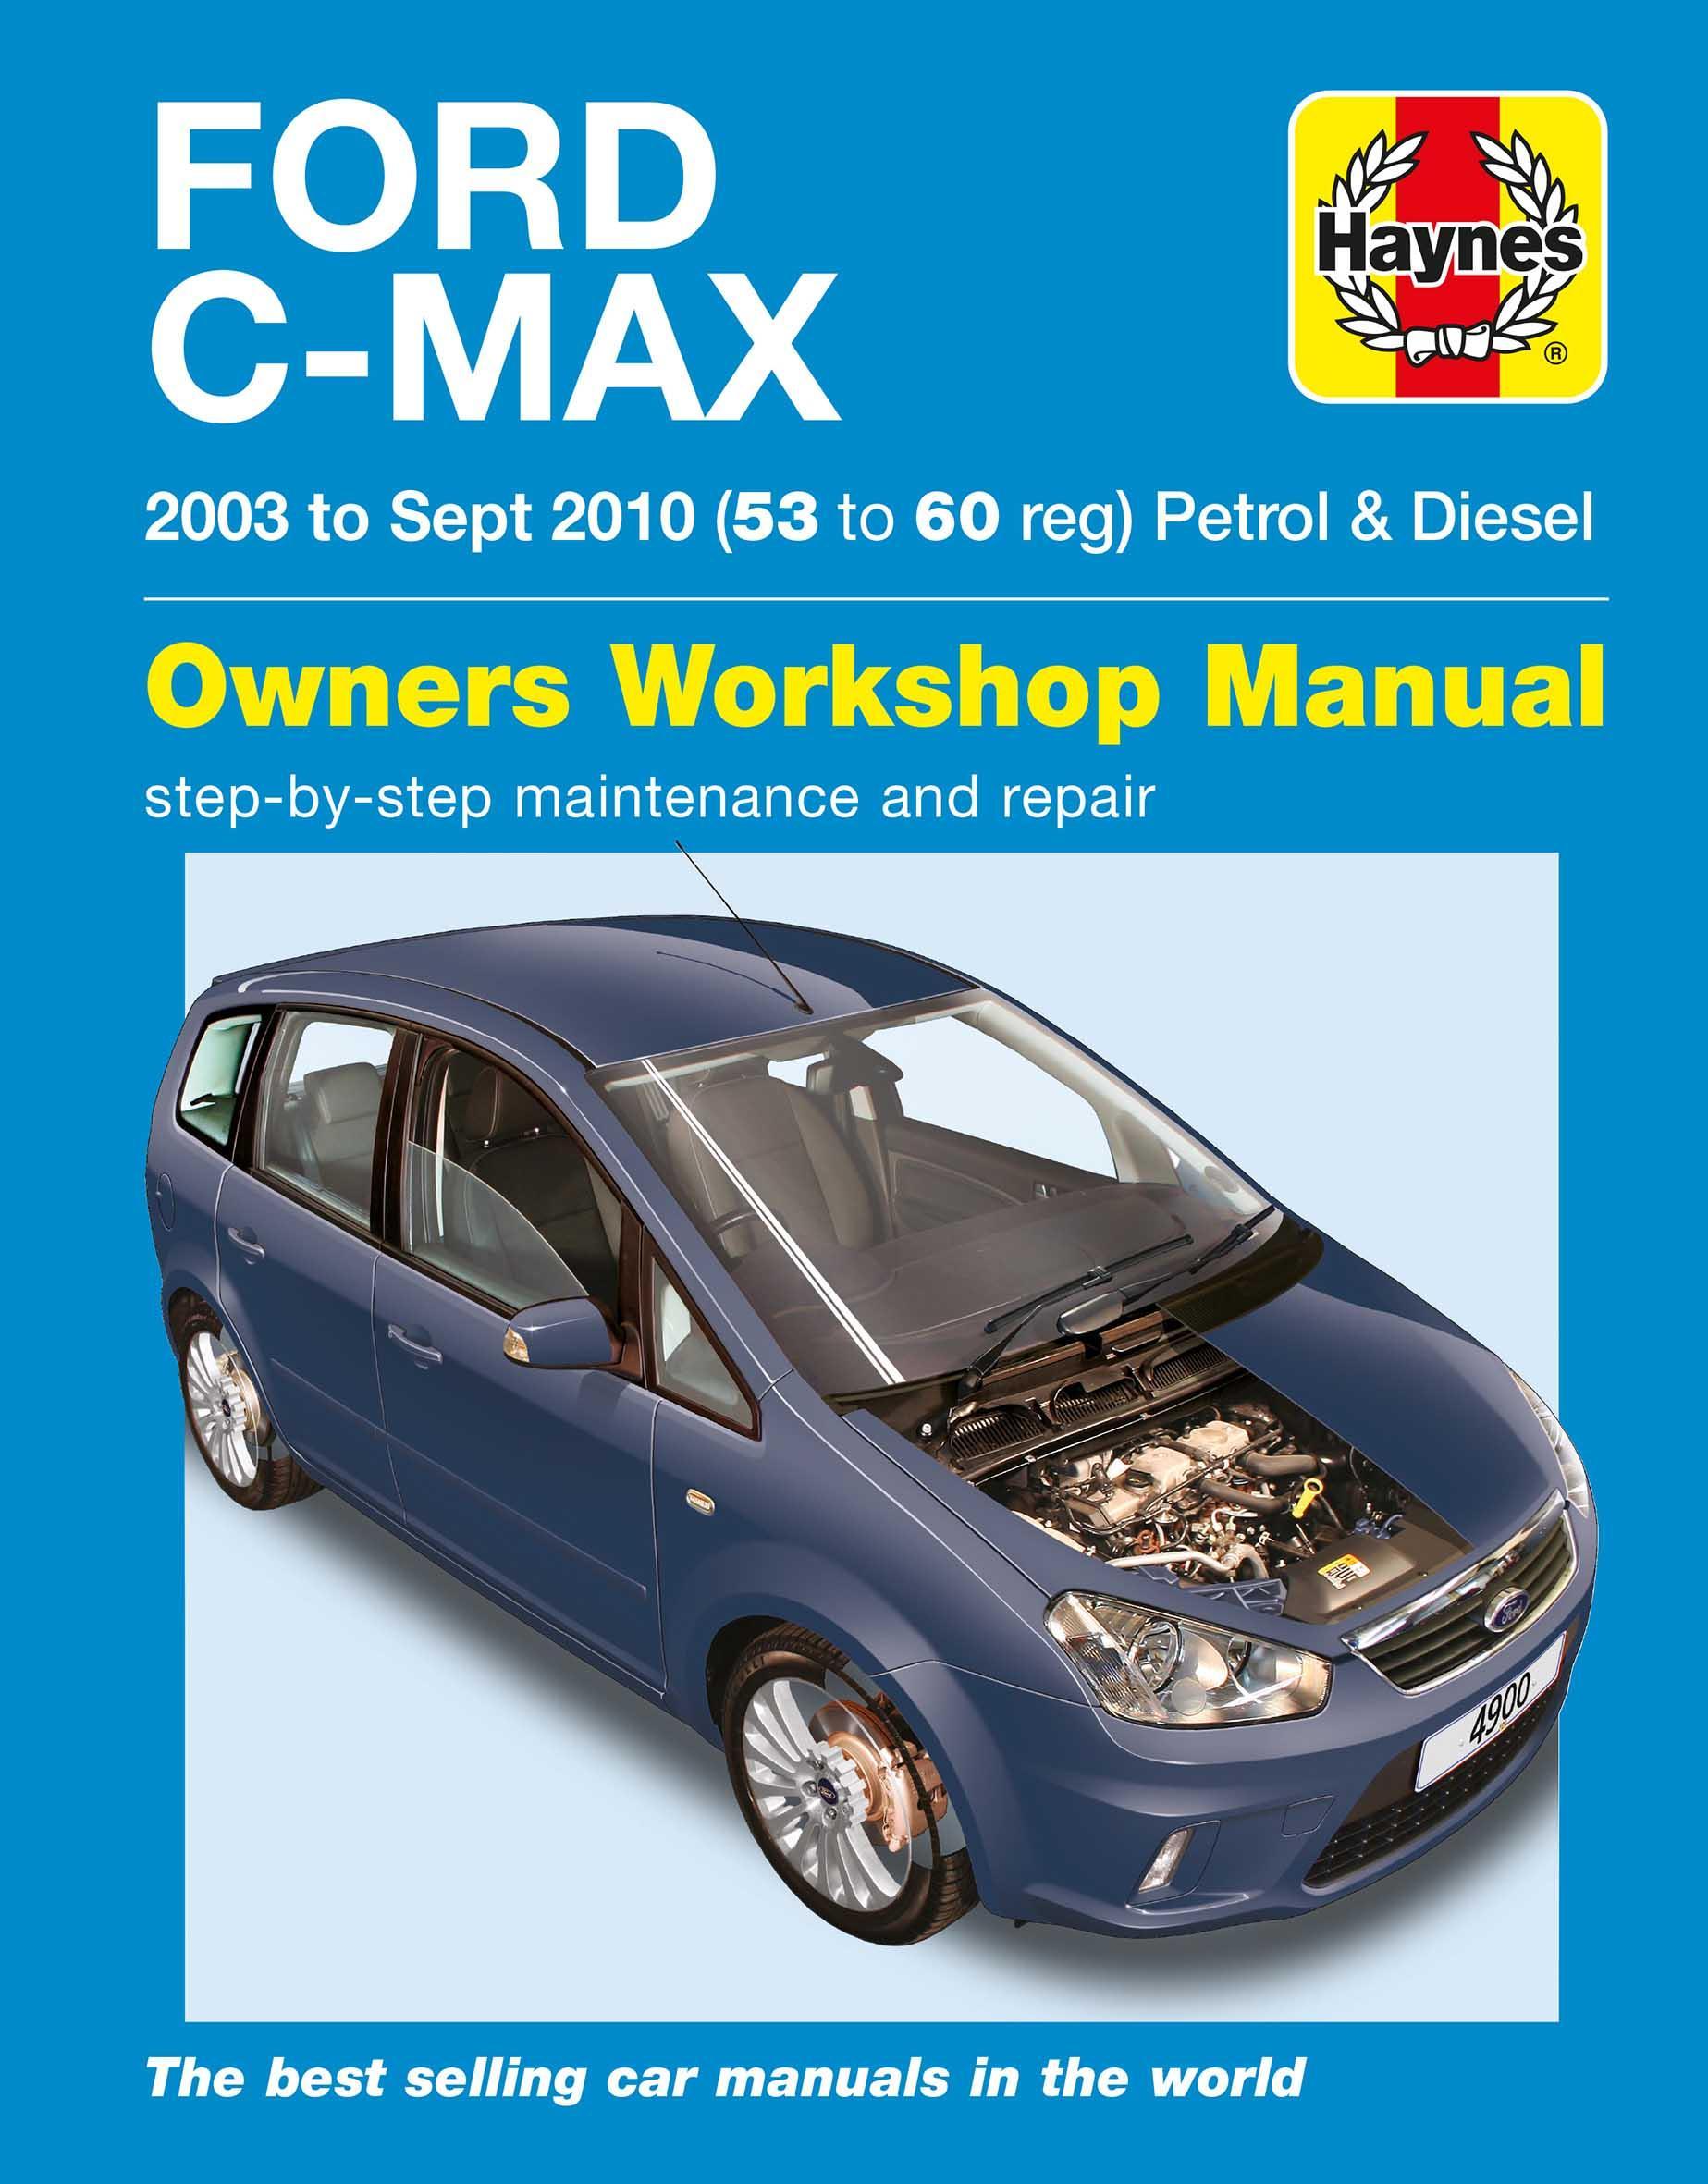 haynes ford c max manual 03 to10 rh halfords com ford focus c max workshop manual pdf ford focus c max service manual pdf